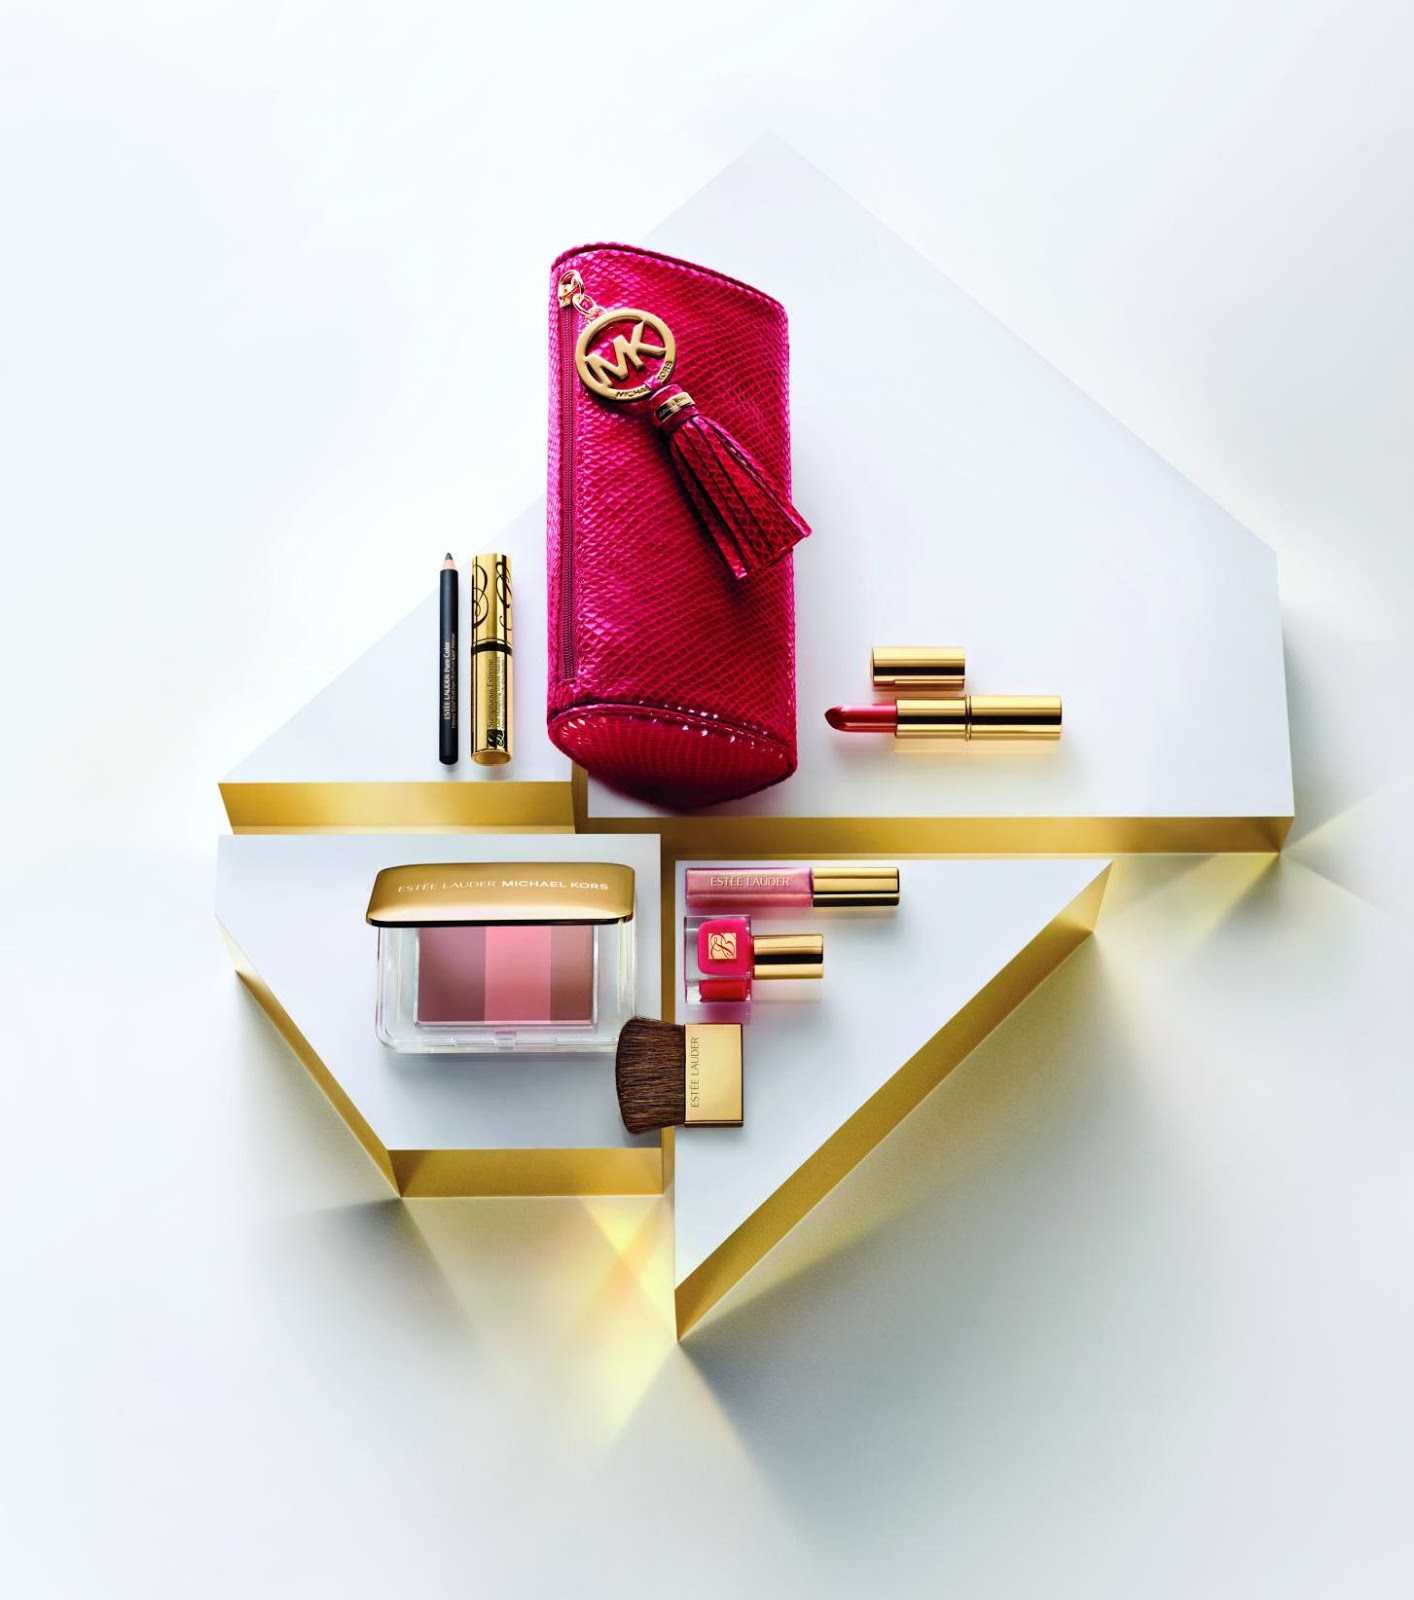 Estee Lauder Perfume Set Estee lauder gives: michael